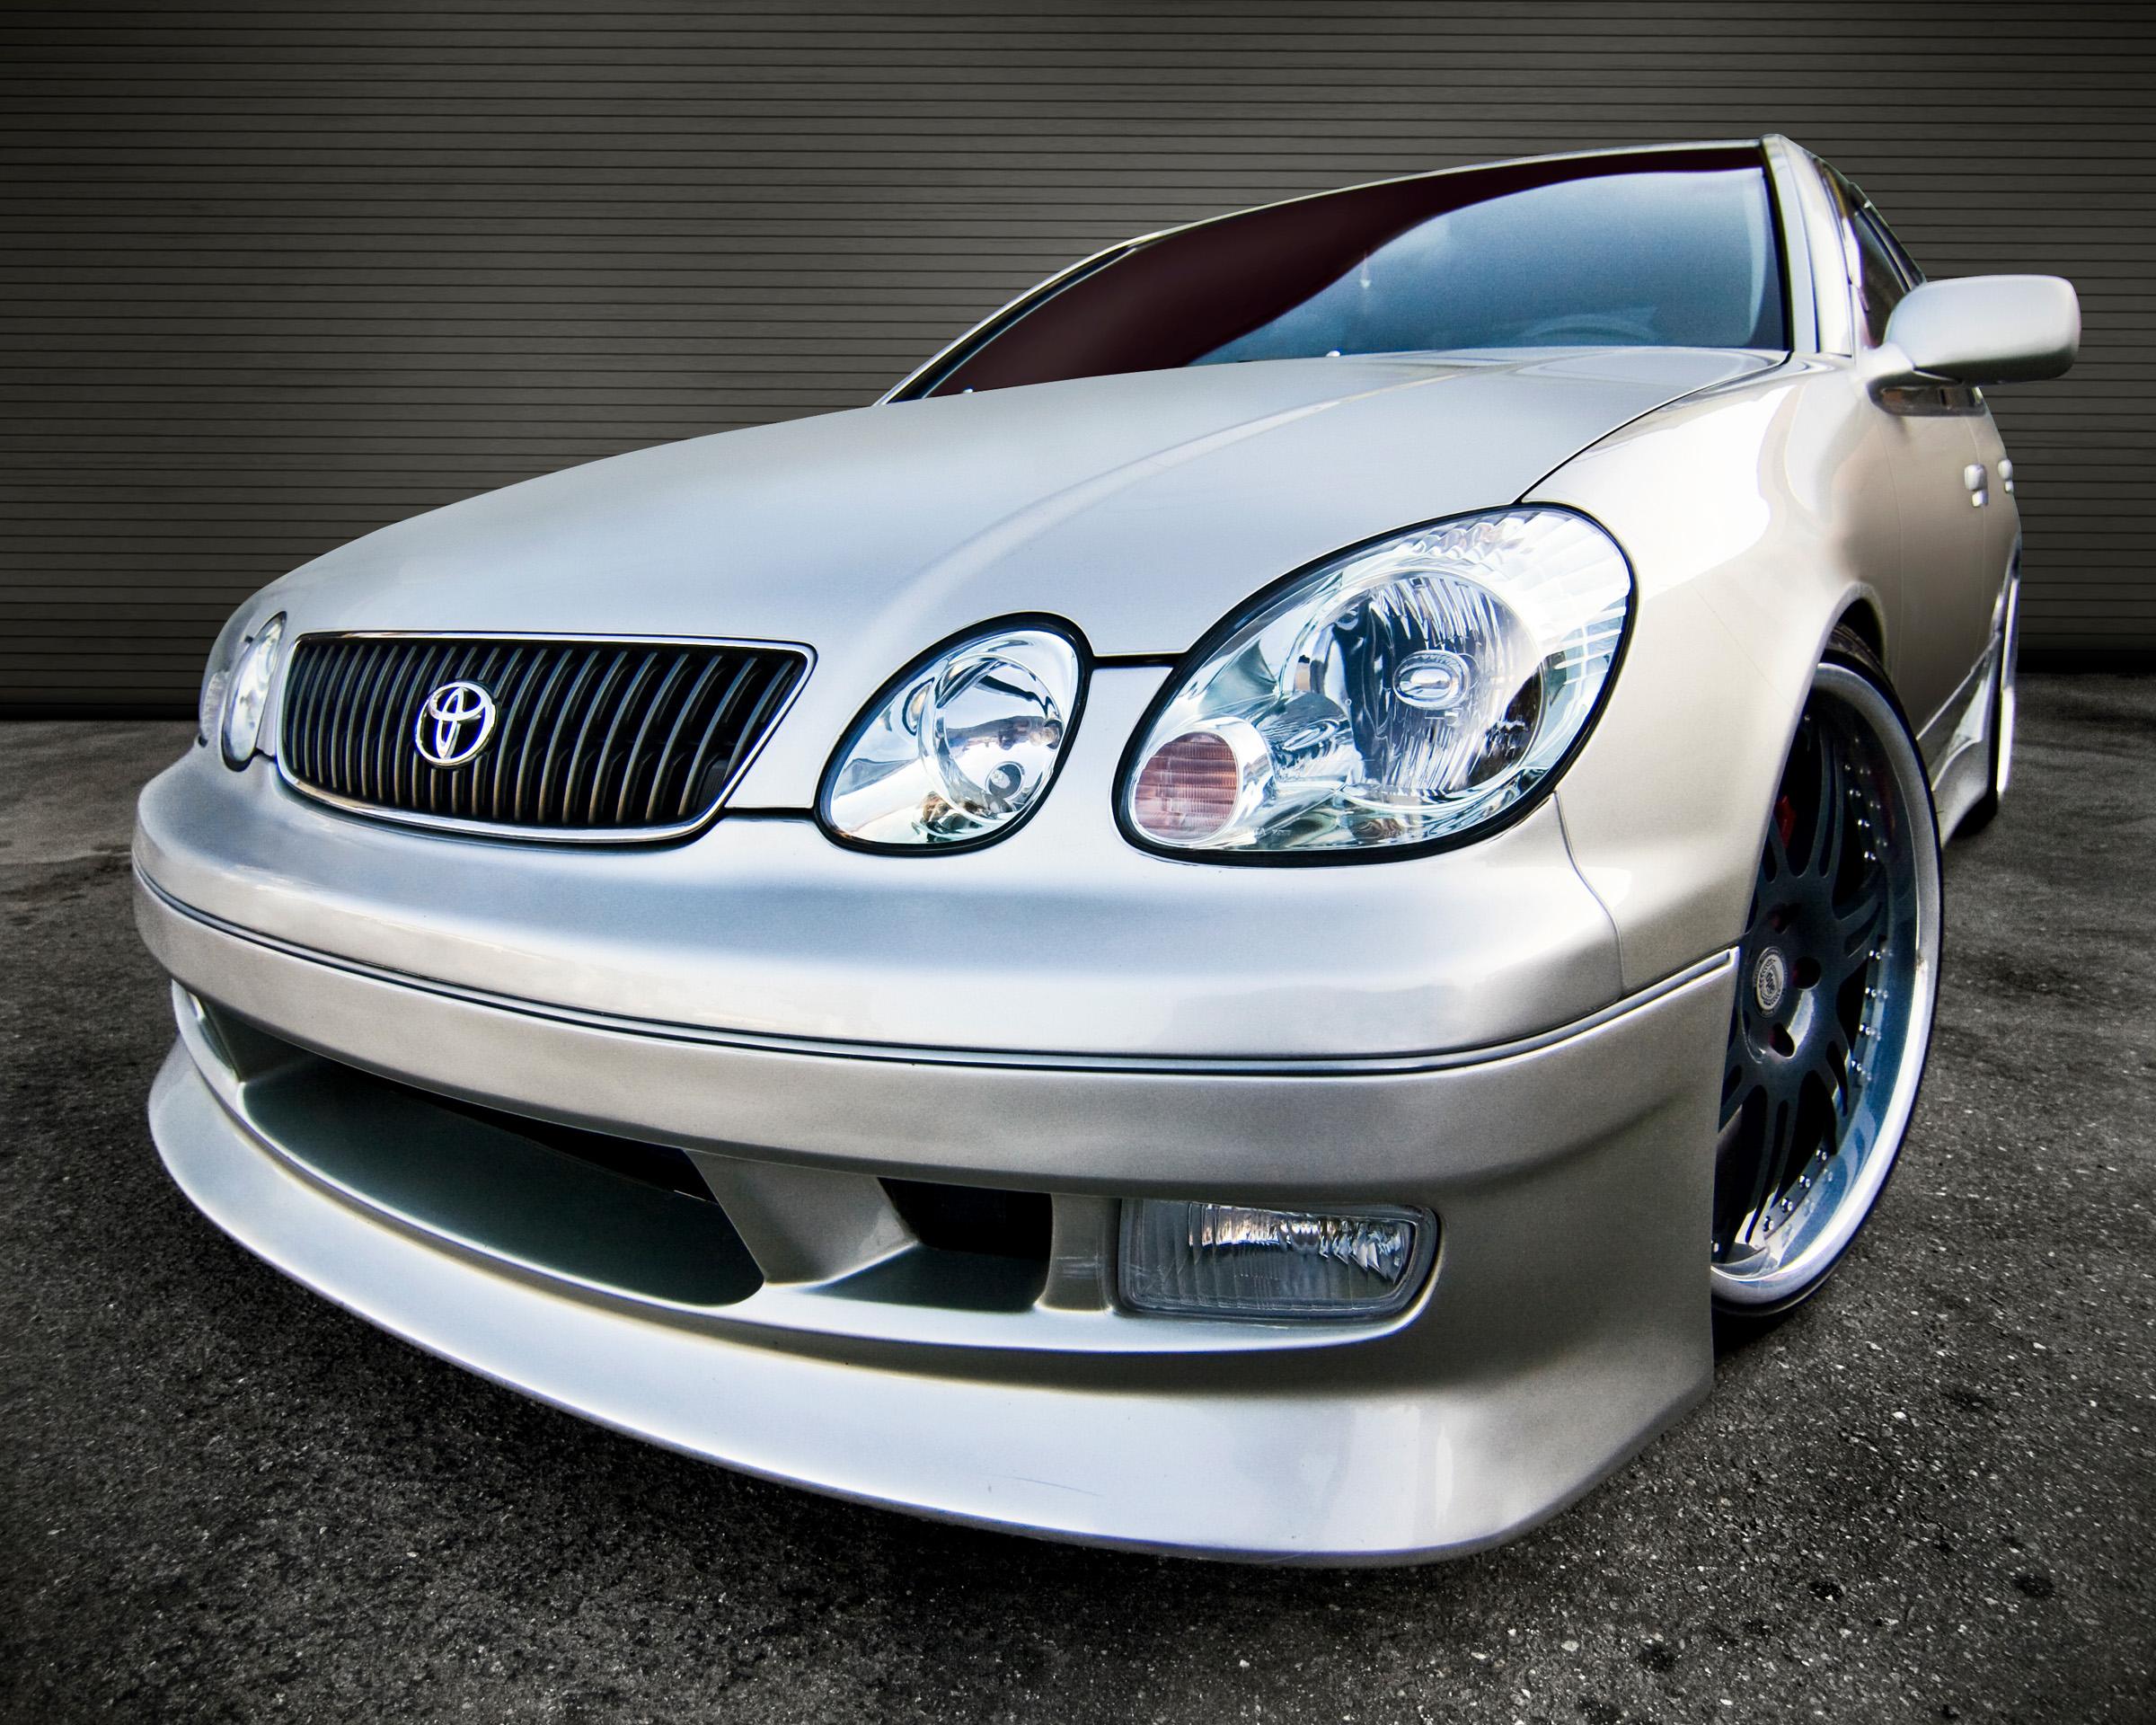 ludwig_ortiz_automotive_0005.jpg